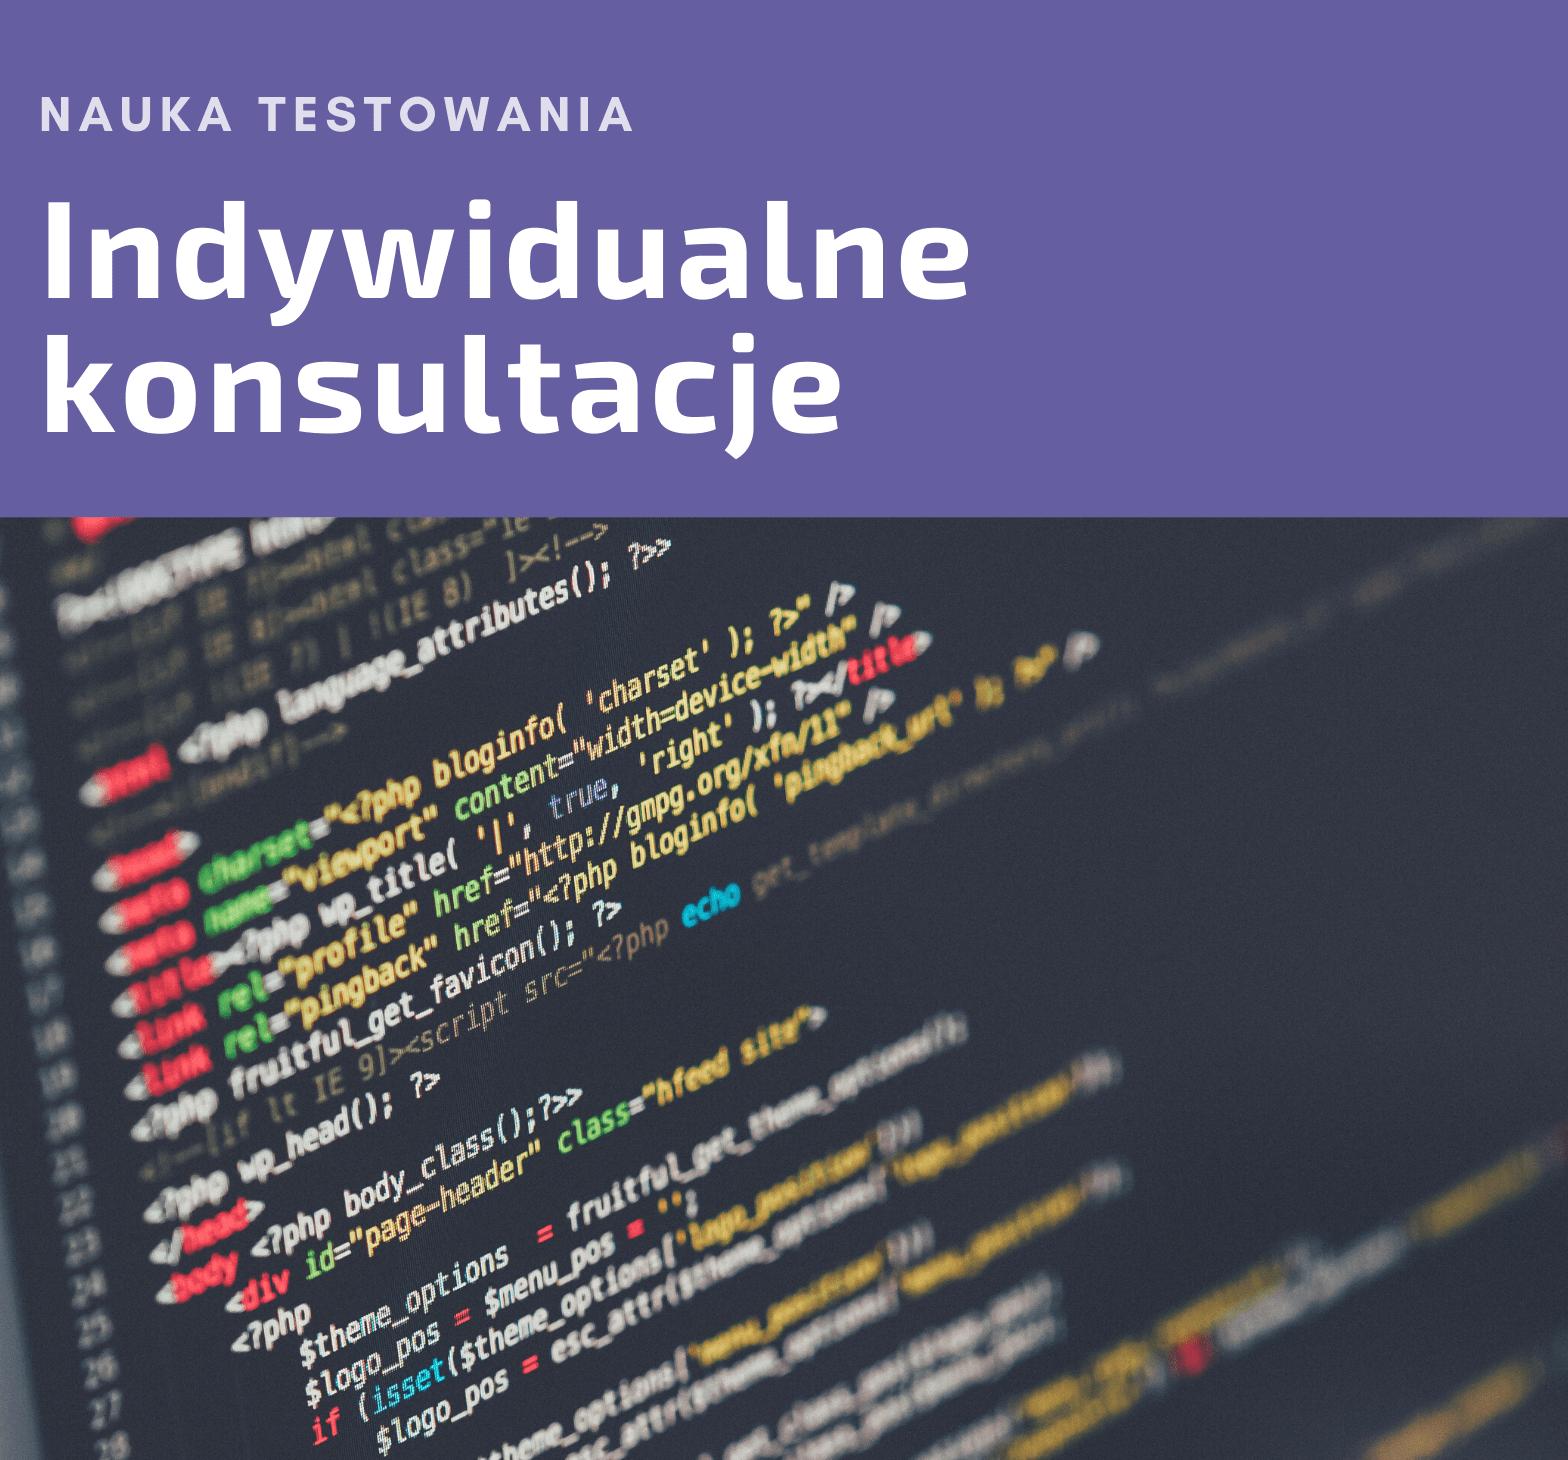 Nauka testowania prywatne konsultacje - krzapa.pl